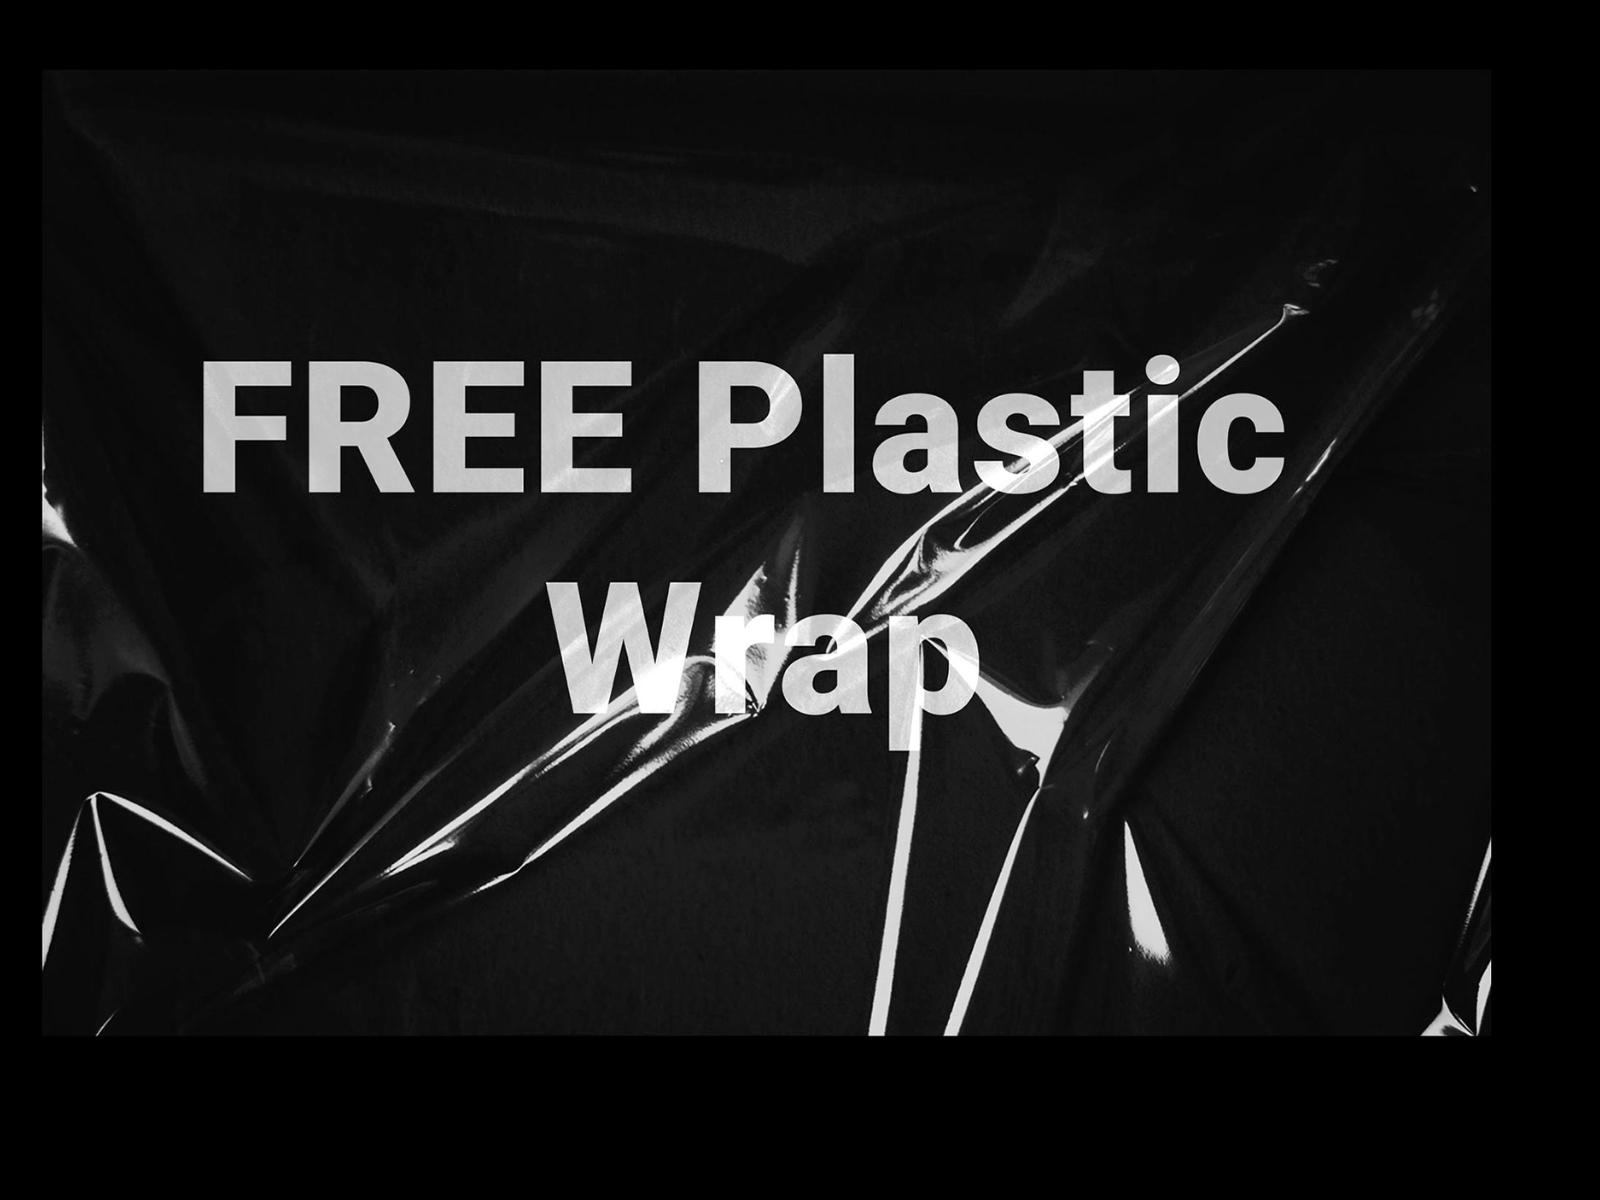 Free Plastic wrap Mockup (psd) cover image